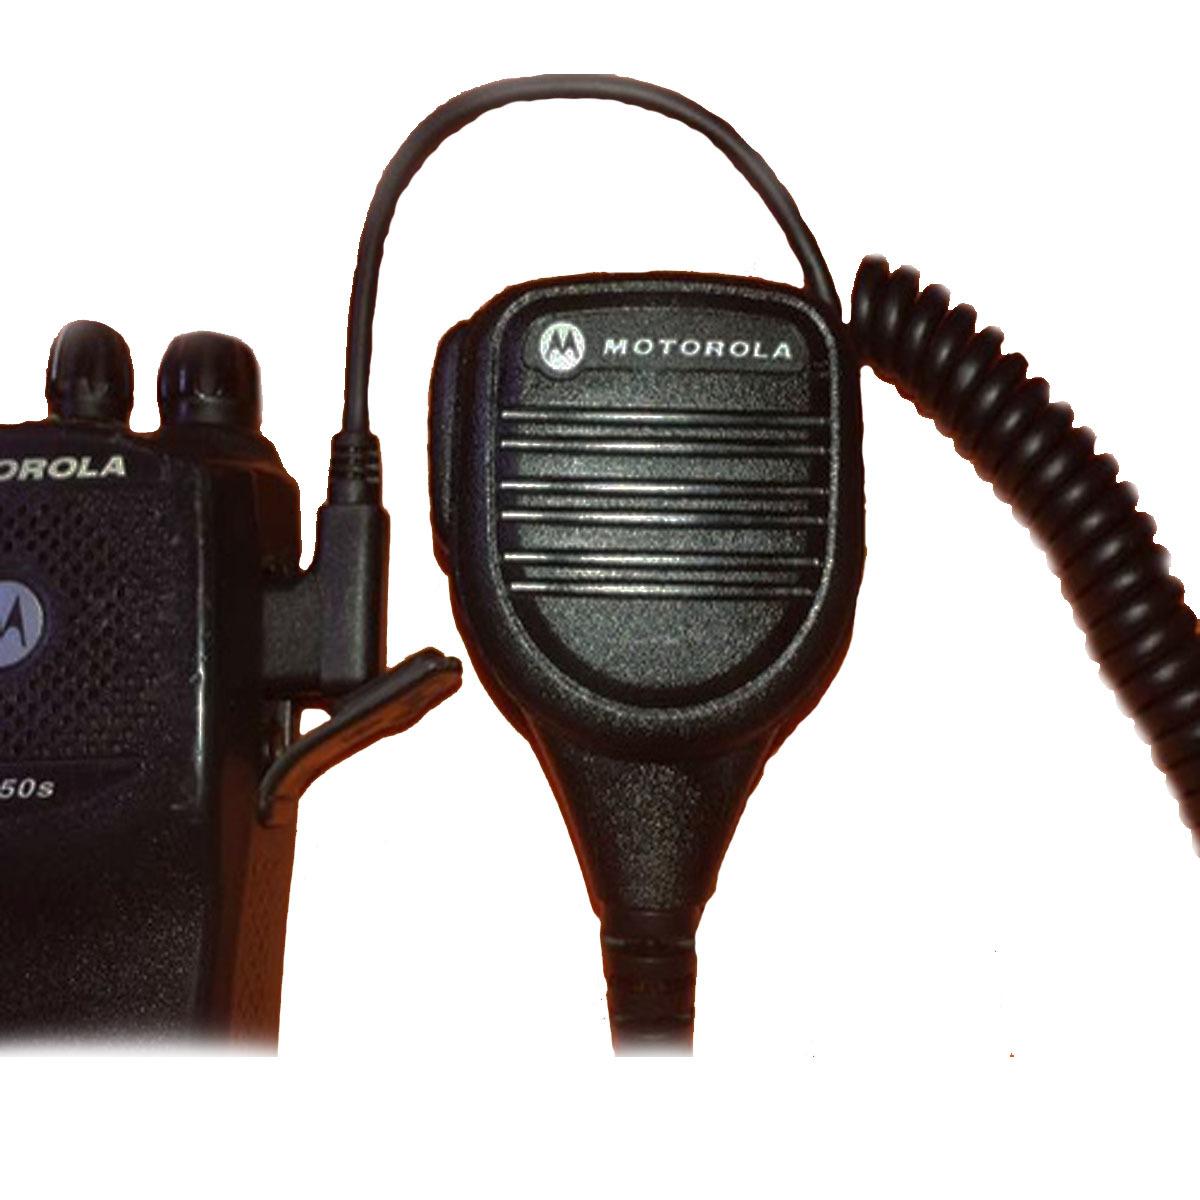 Micrófono Motorola parlante de solapa PMMN4029A